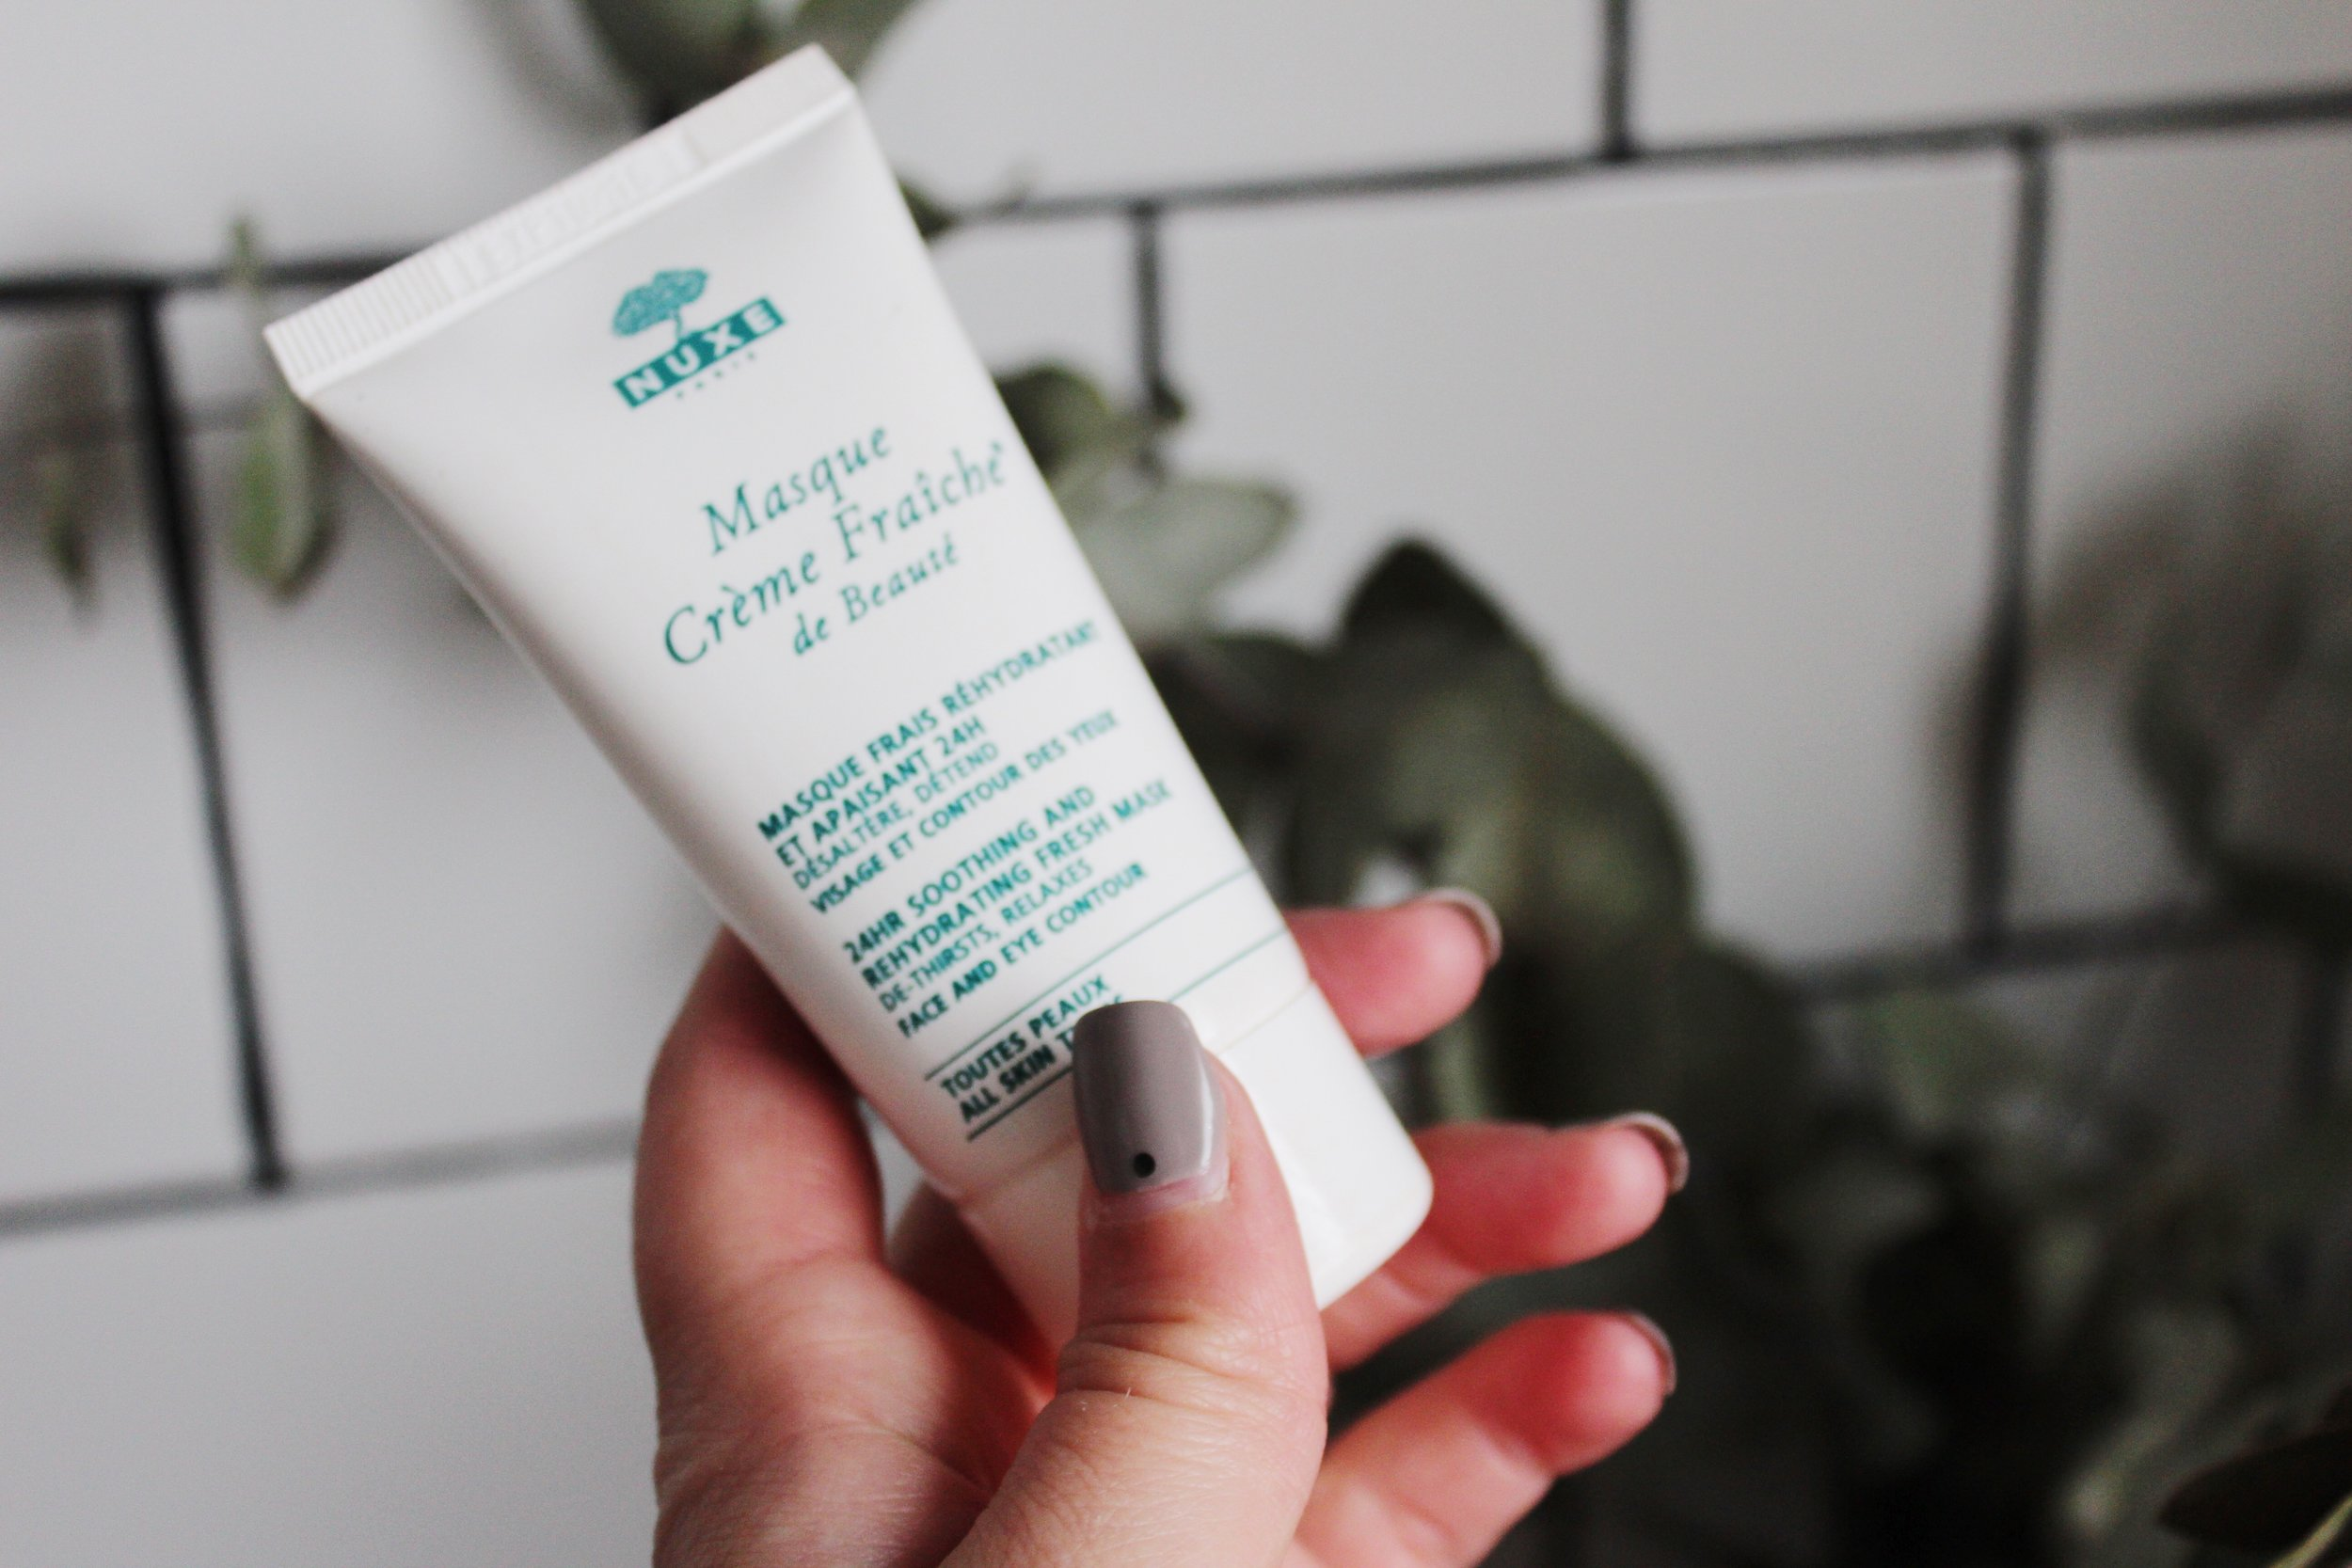 NUXE Masque Creme Fraiche, Feel Unique, £12